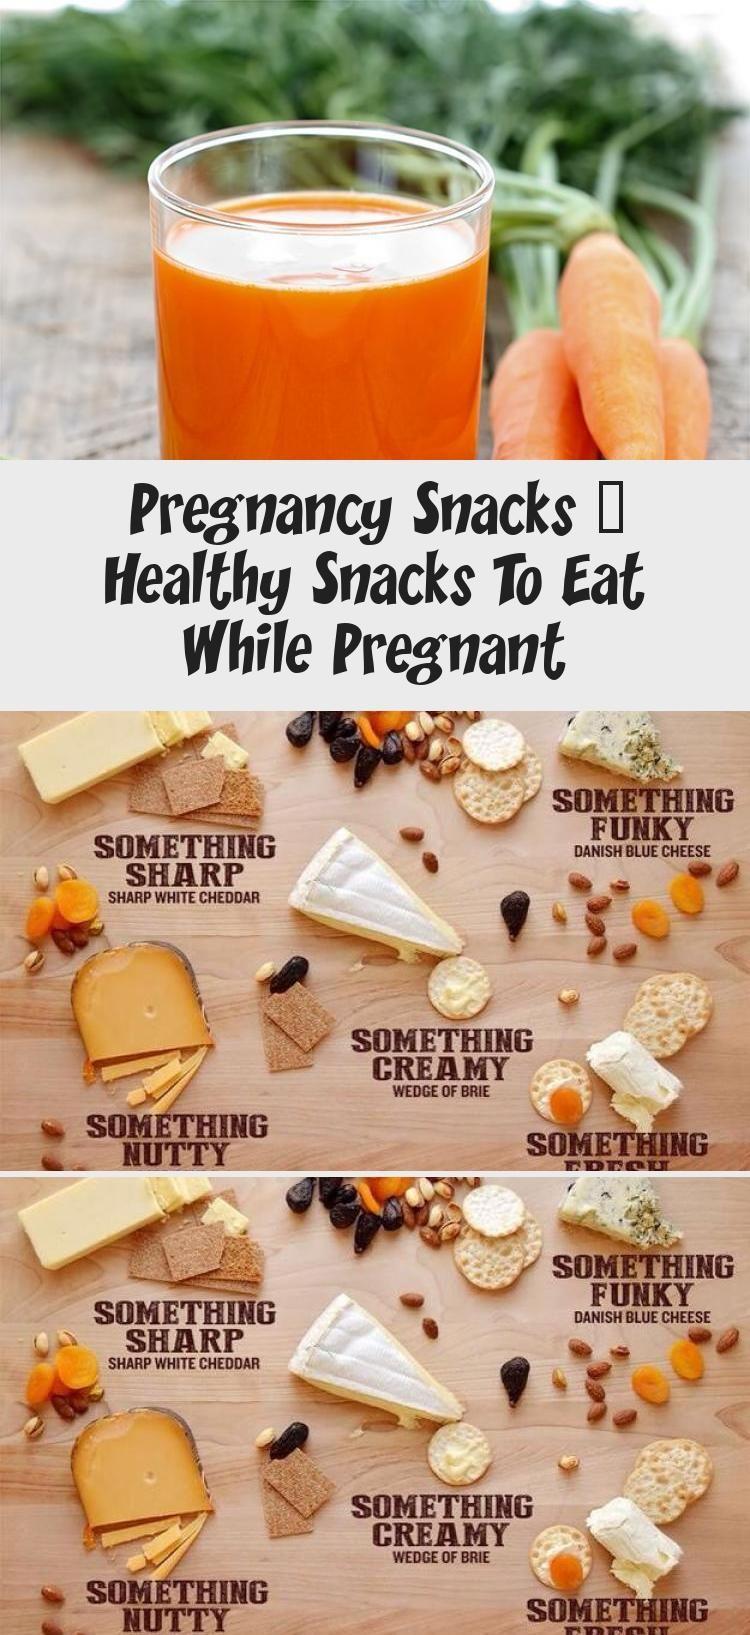 blue cheese when pregnant  pregnant twins